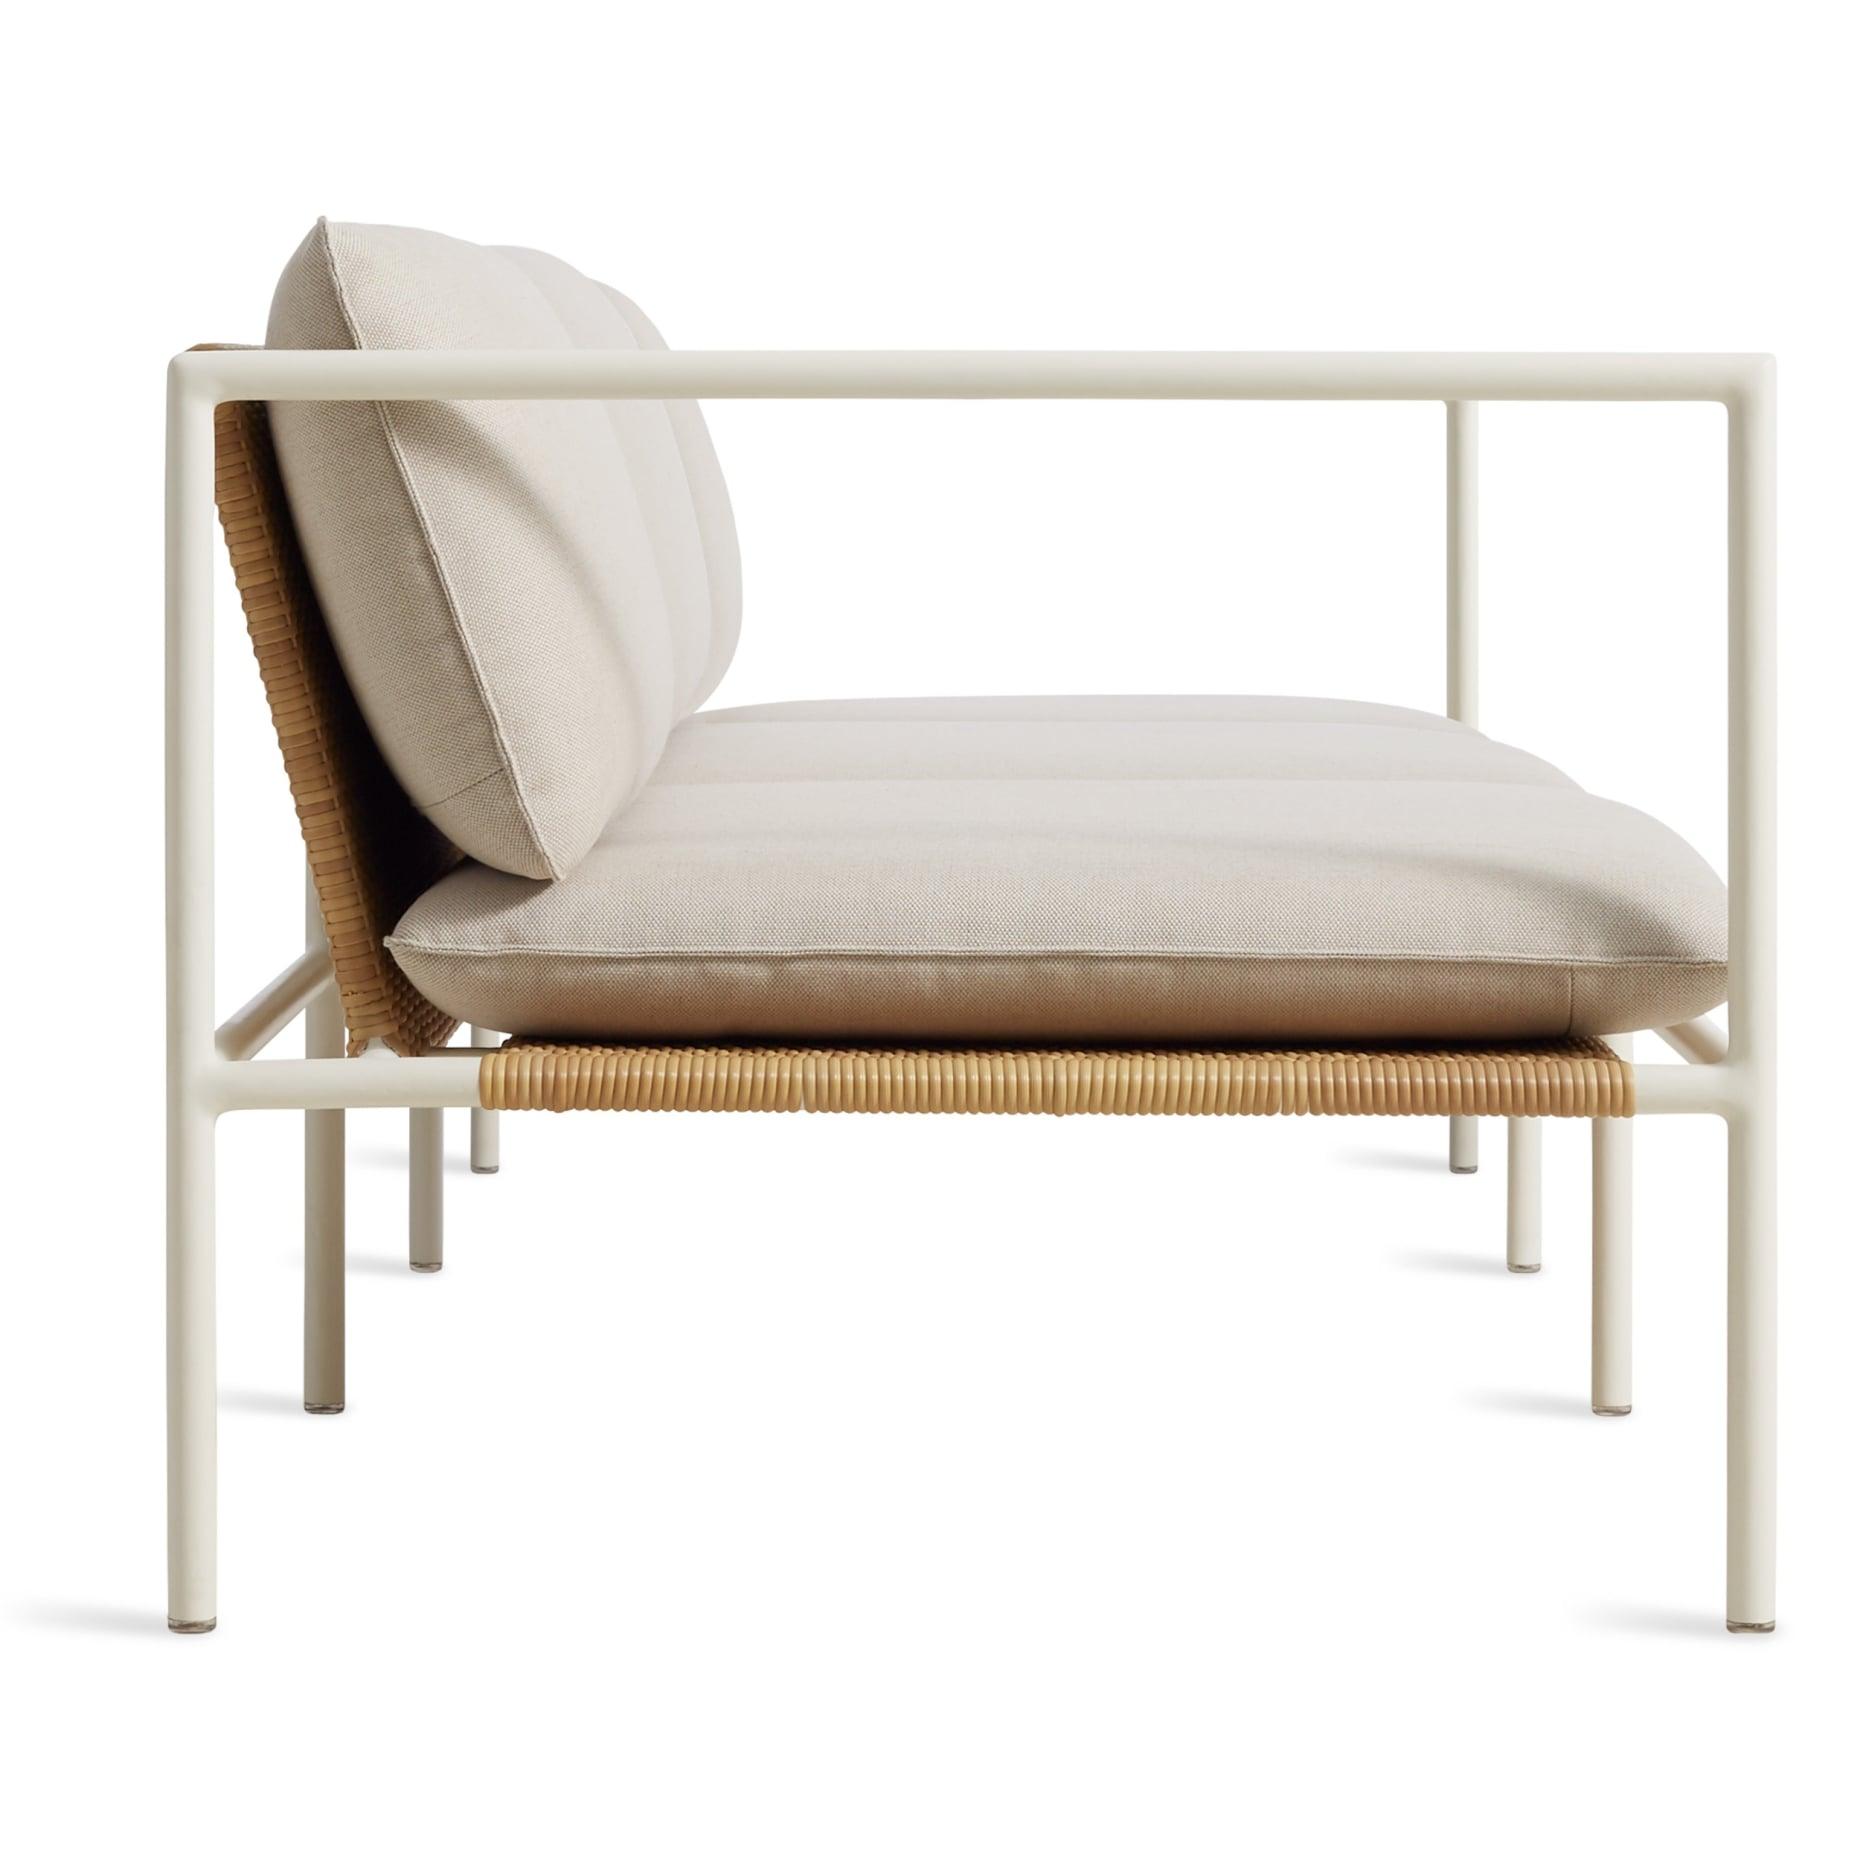 dg1 3stsfa ln sidelow dog days outdoor 3 seat sofa sunbrella linen white